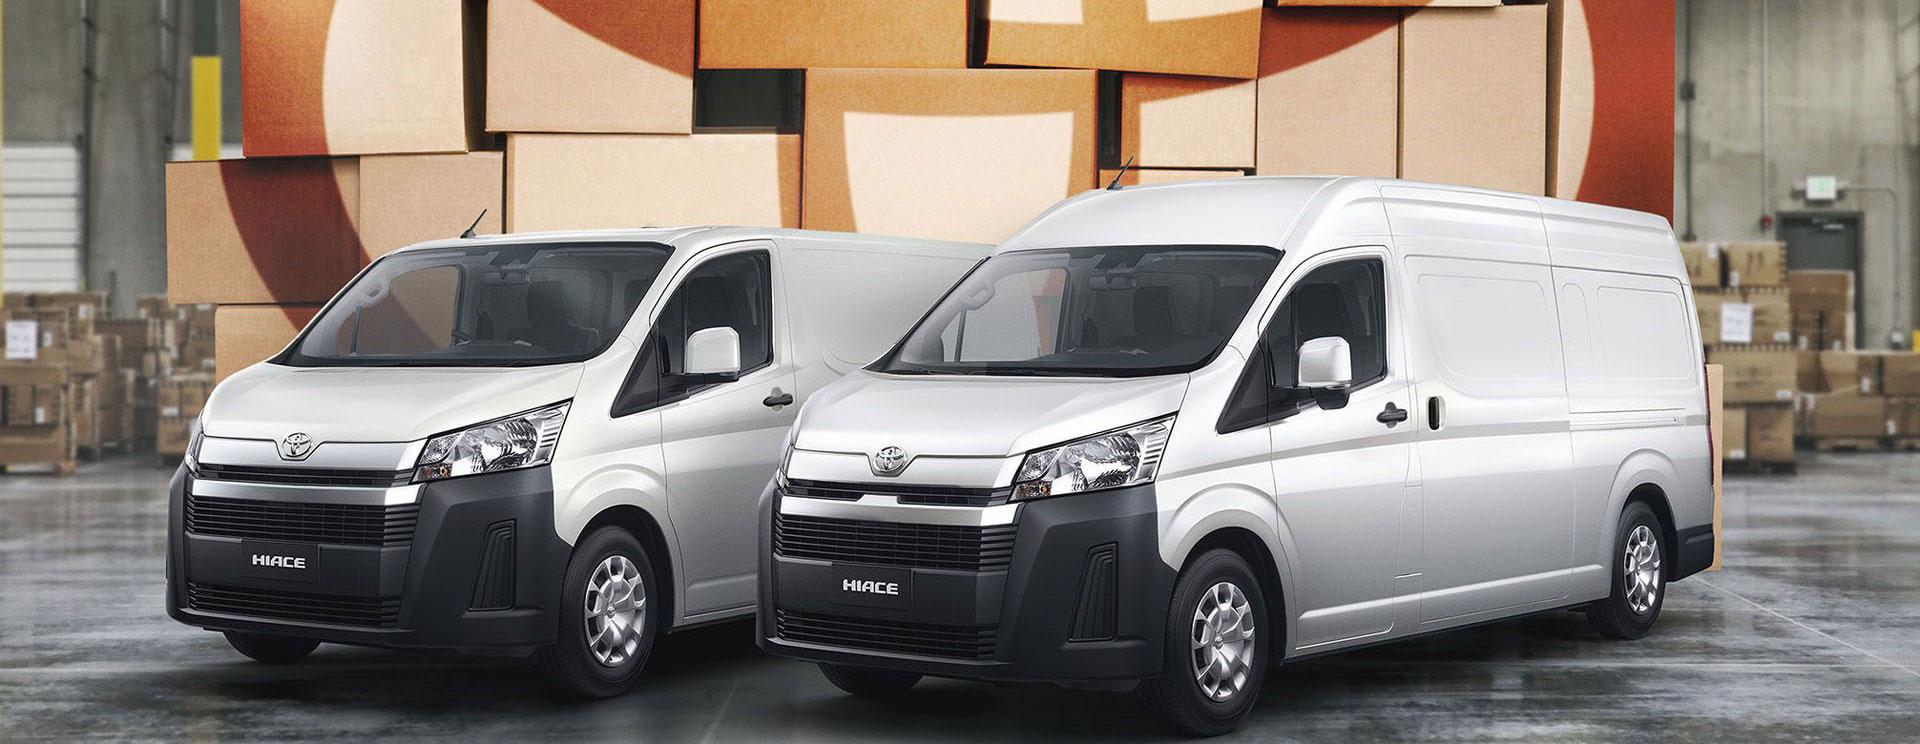 Toyota lanzó el furgón Hiace